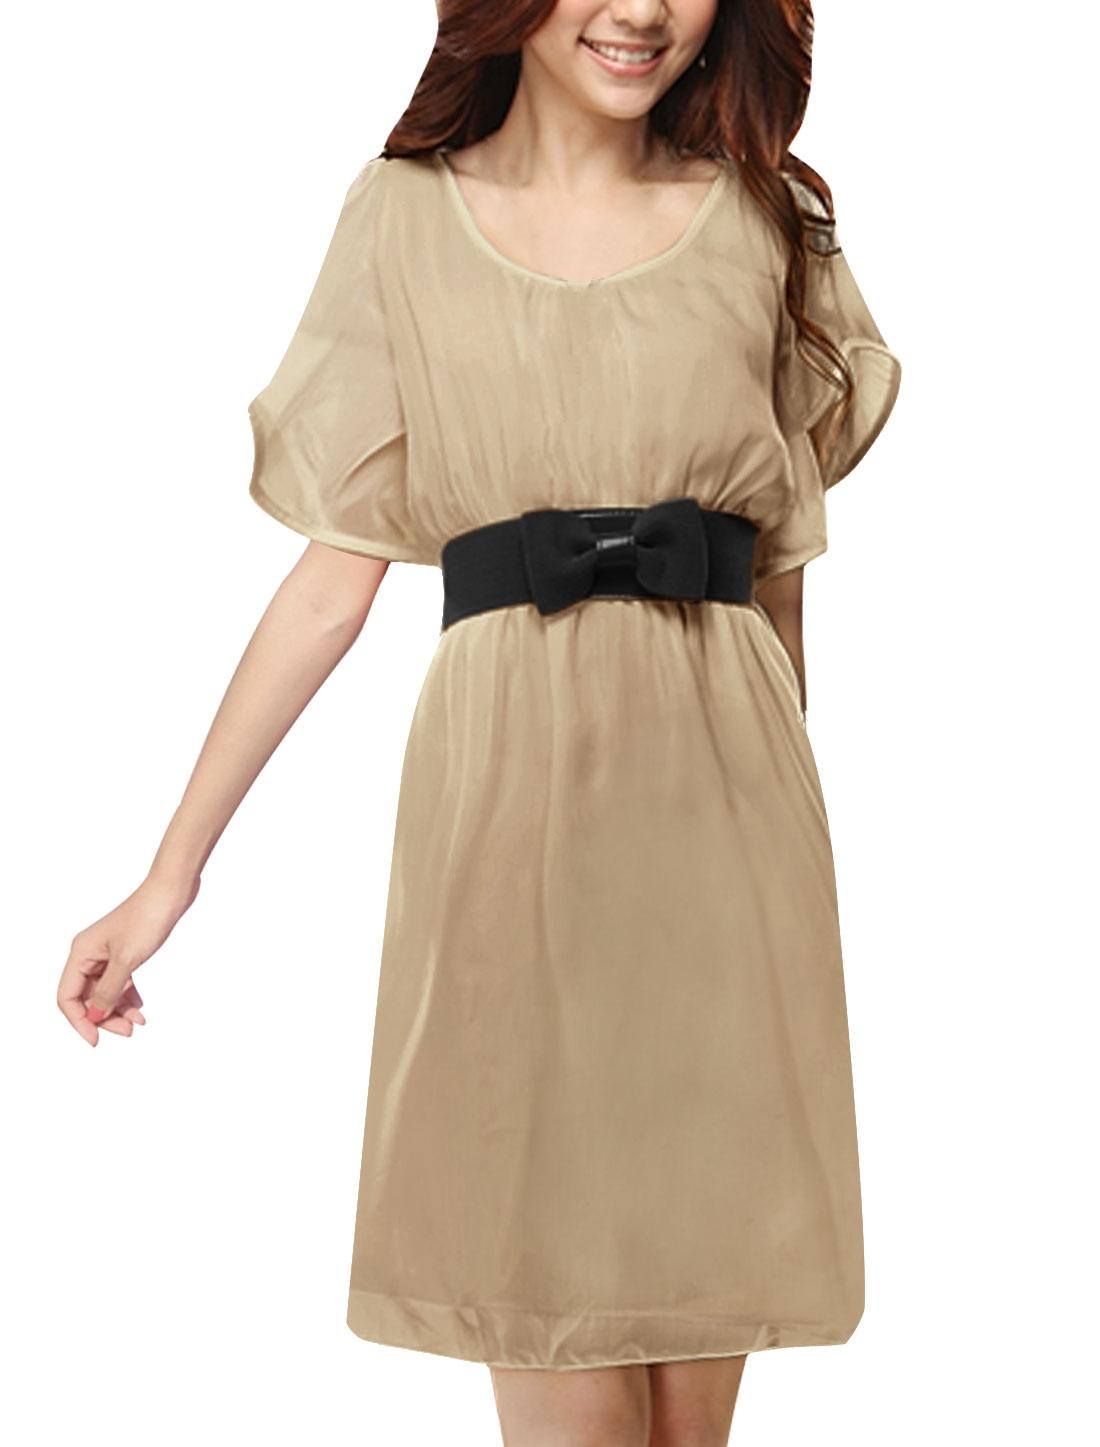 Woman NEW Scoop Neck Ruffled Short Sleeve Solid Beige Above Knee Dress L